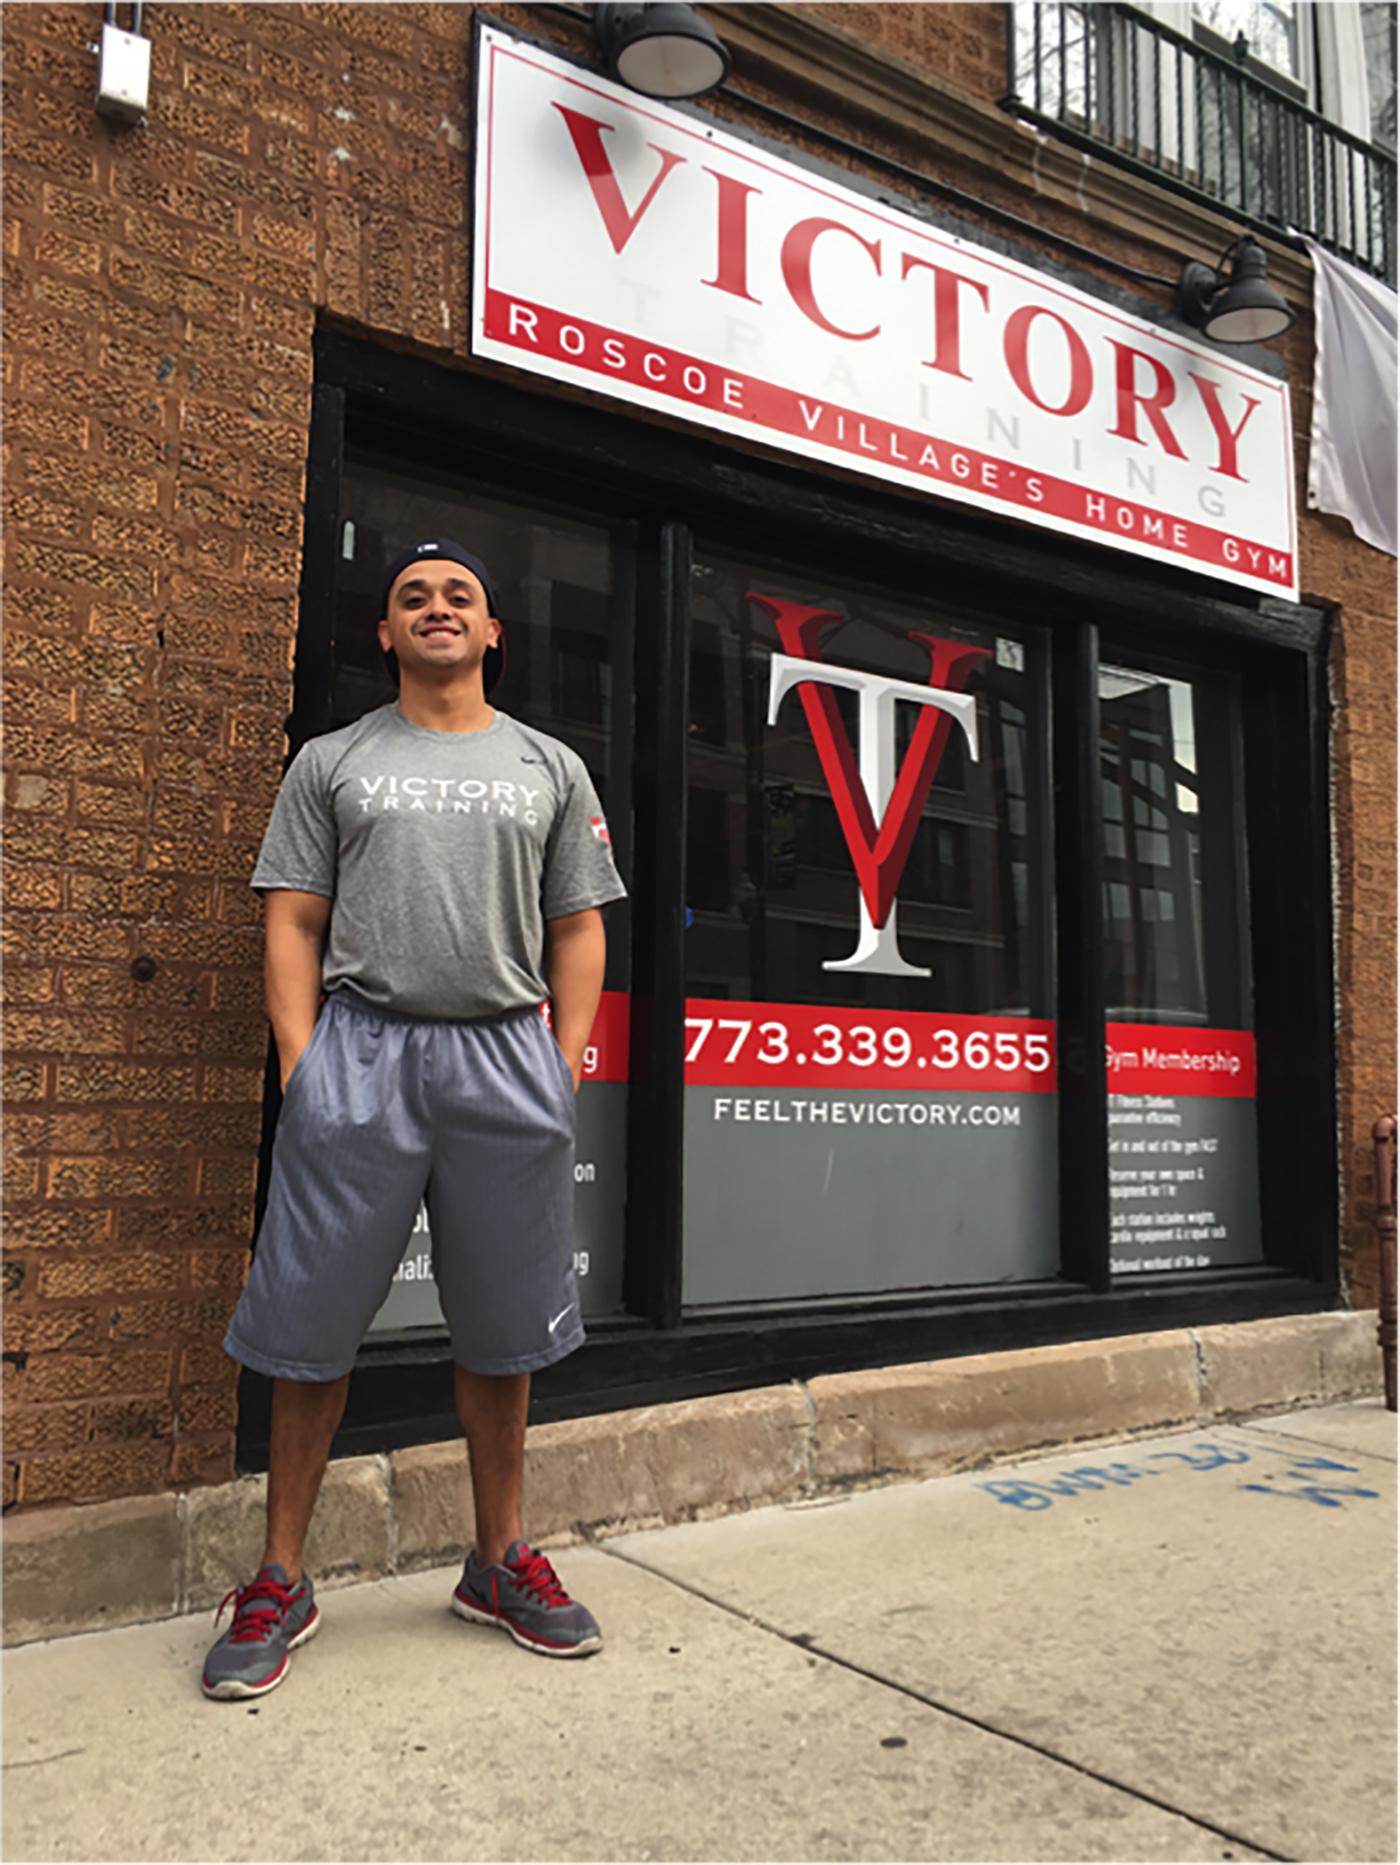 Victory Training